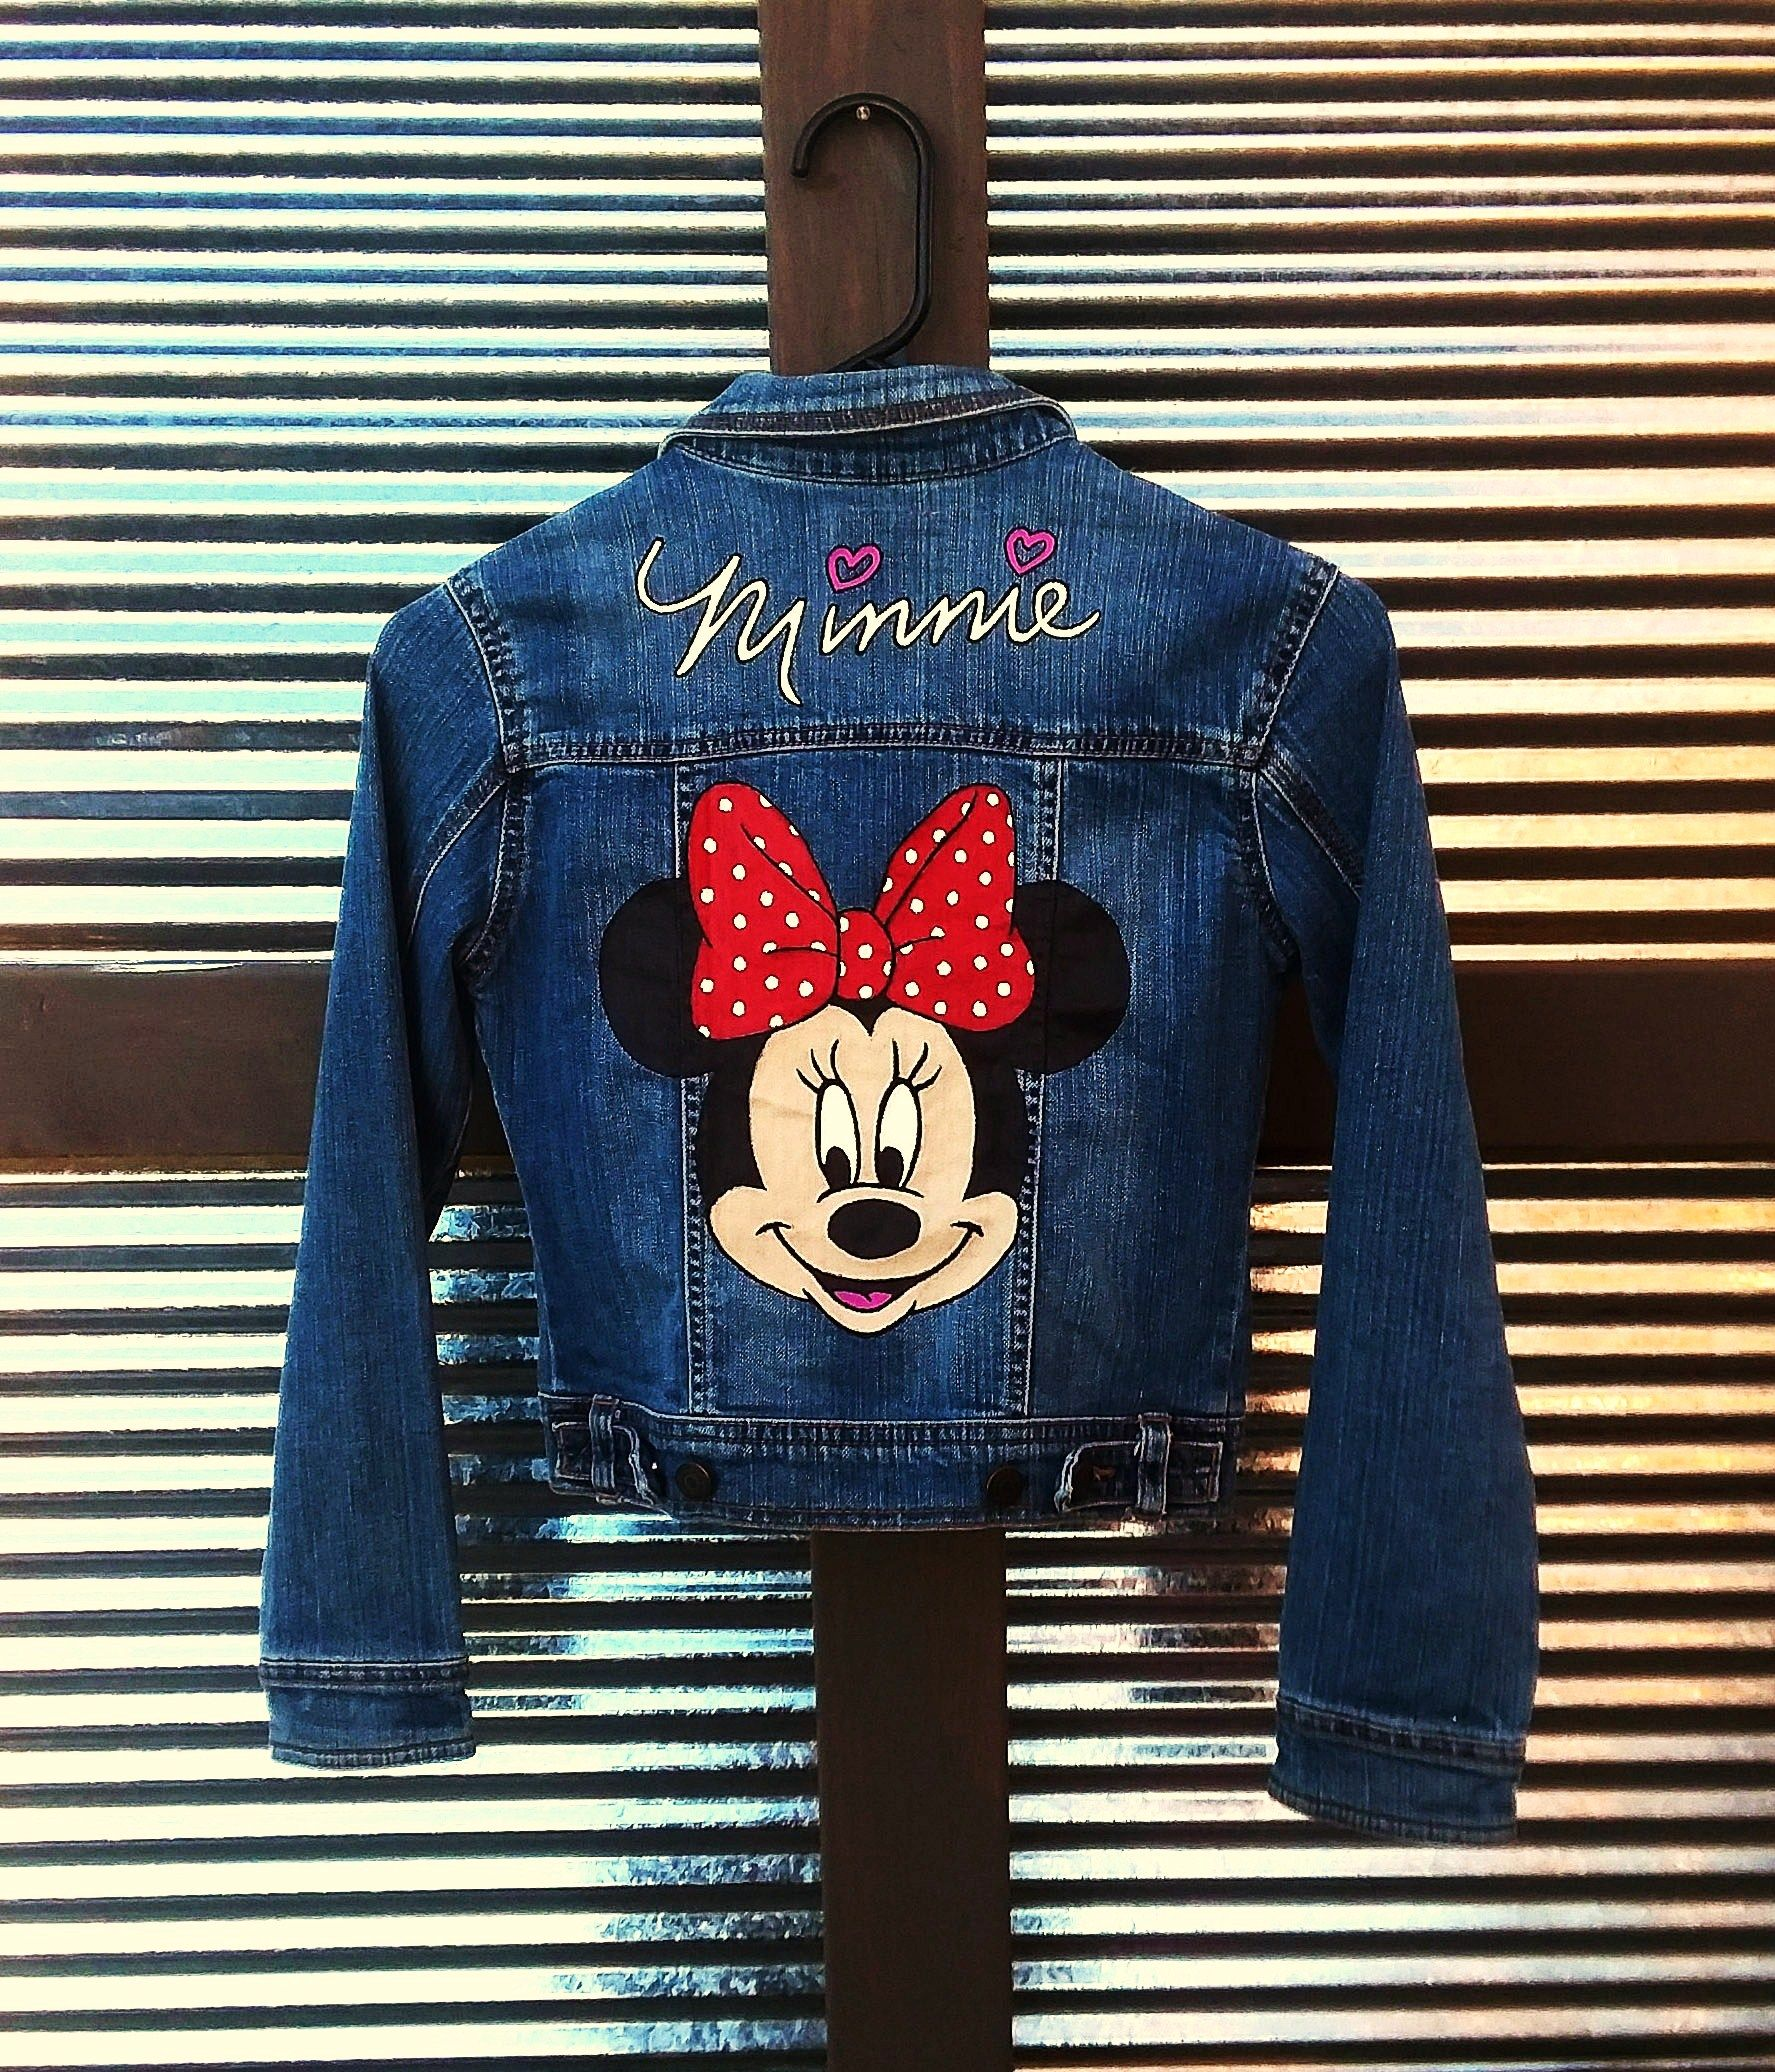 Hand Painted Disney S Minnie Mouse On A Girls Denim Jean Jacket By Bleudoor On Instagram Chaquetas De Mezclilla Arte Con Mezclilla Chamarra Con Bordados [ 2072 x 1775 Pixel ]